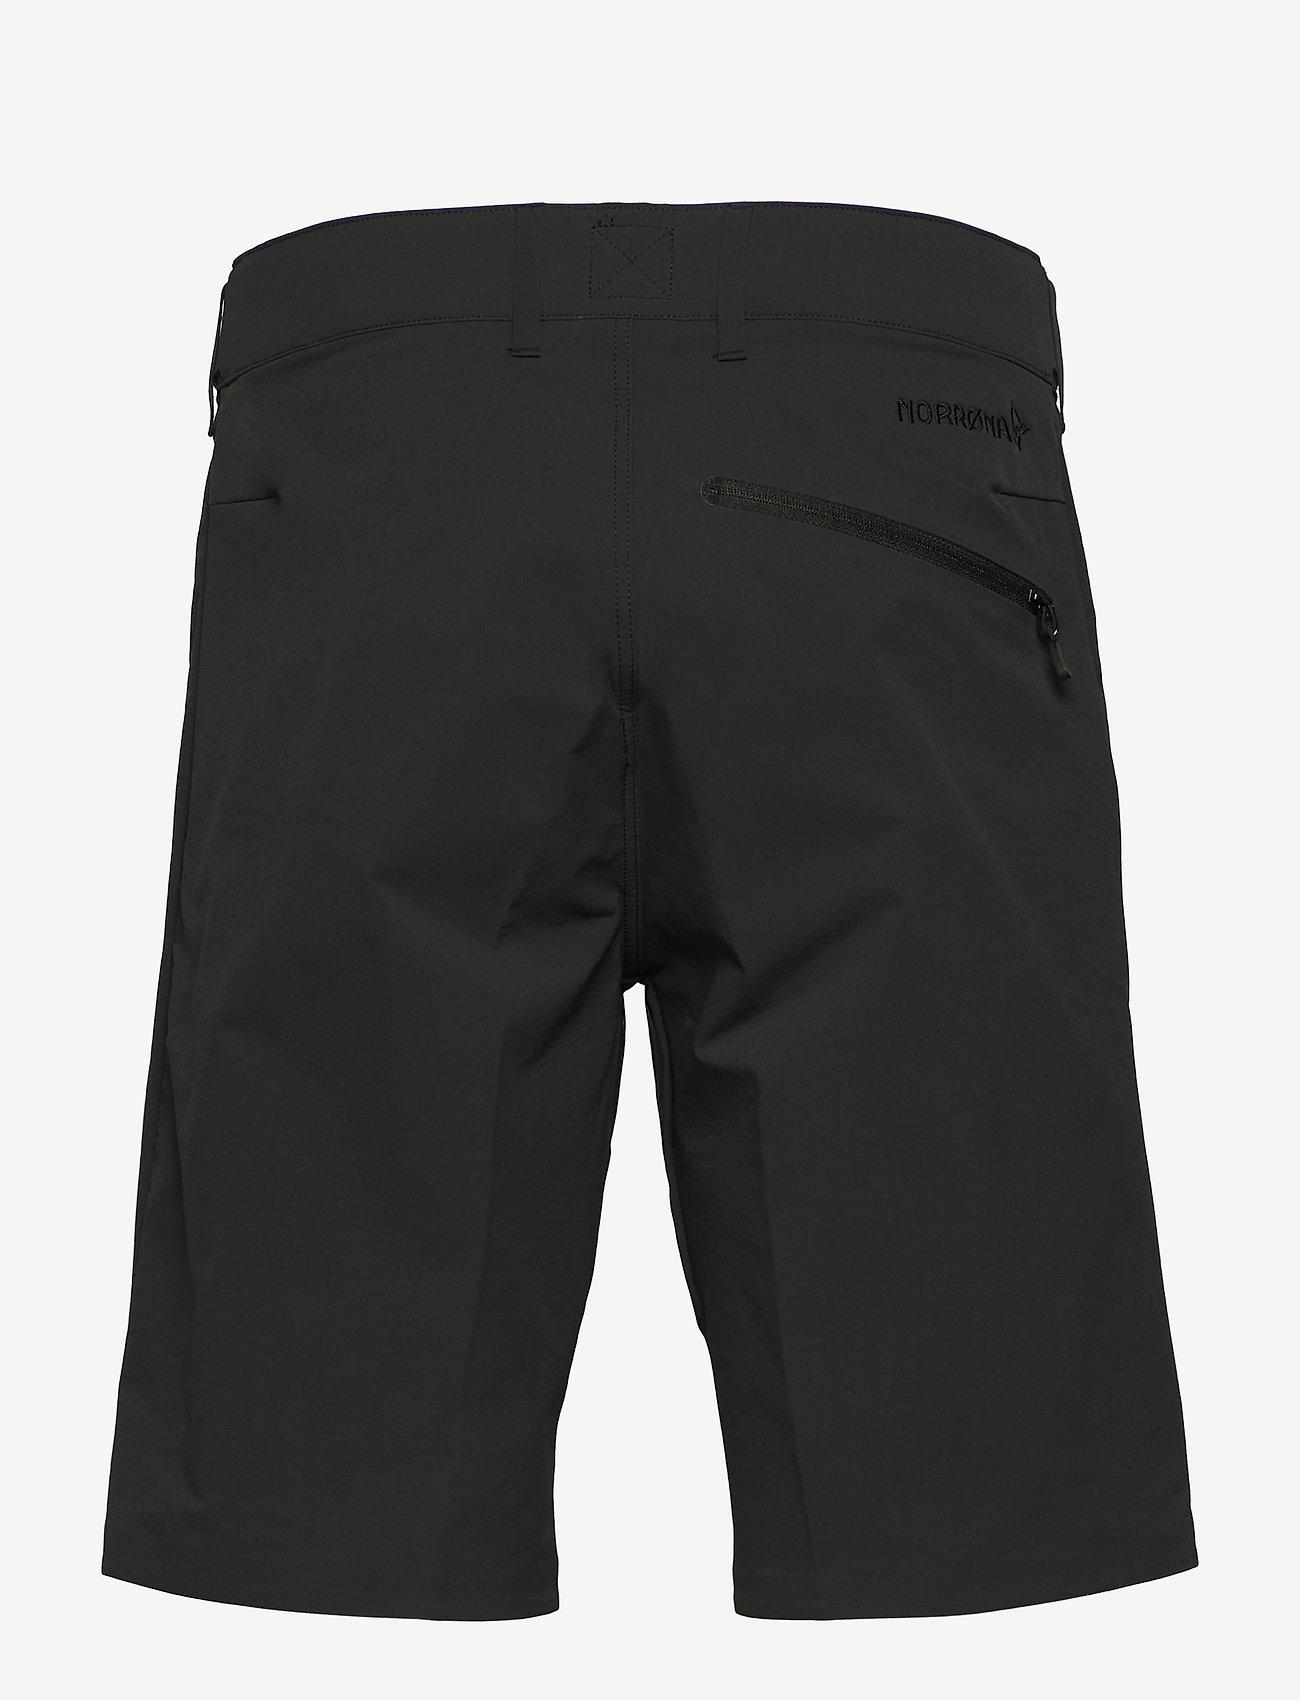 Norrøna - falketind flex1 Shorts M's - training korte broek - caviar - 1